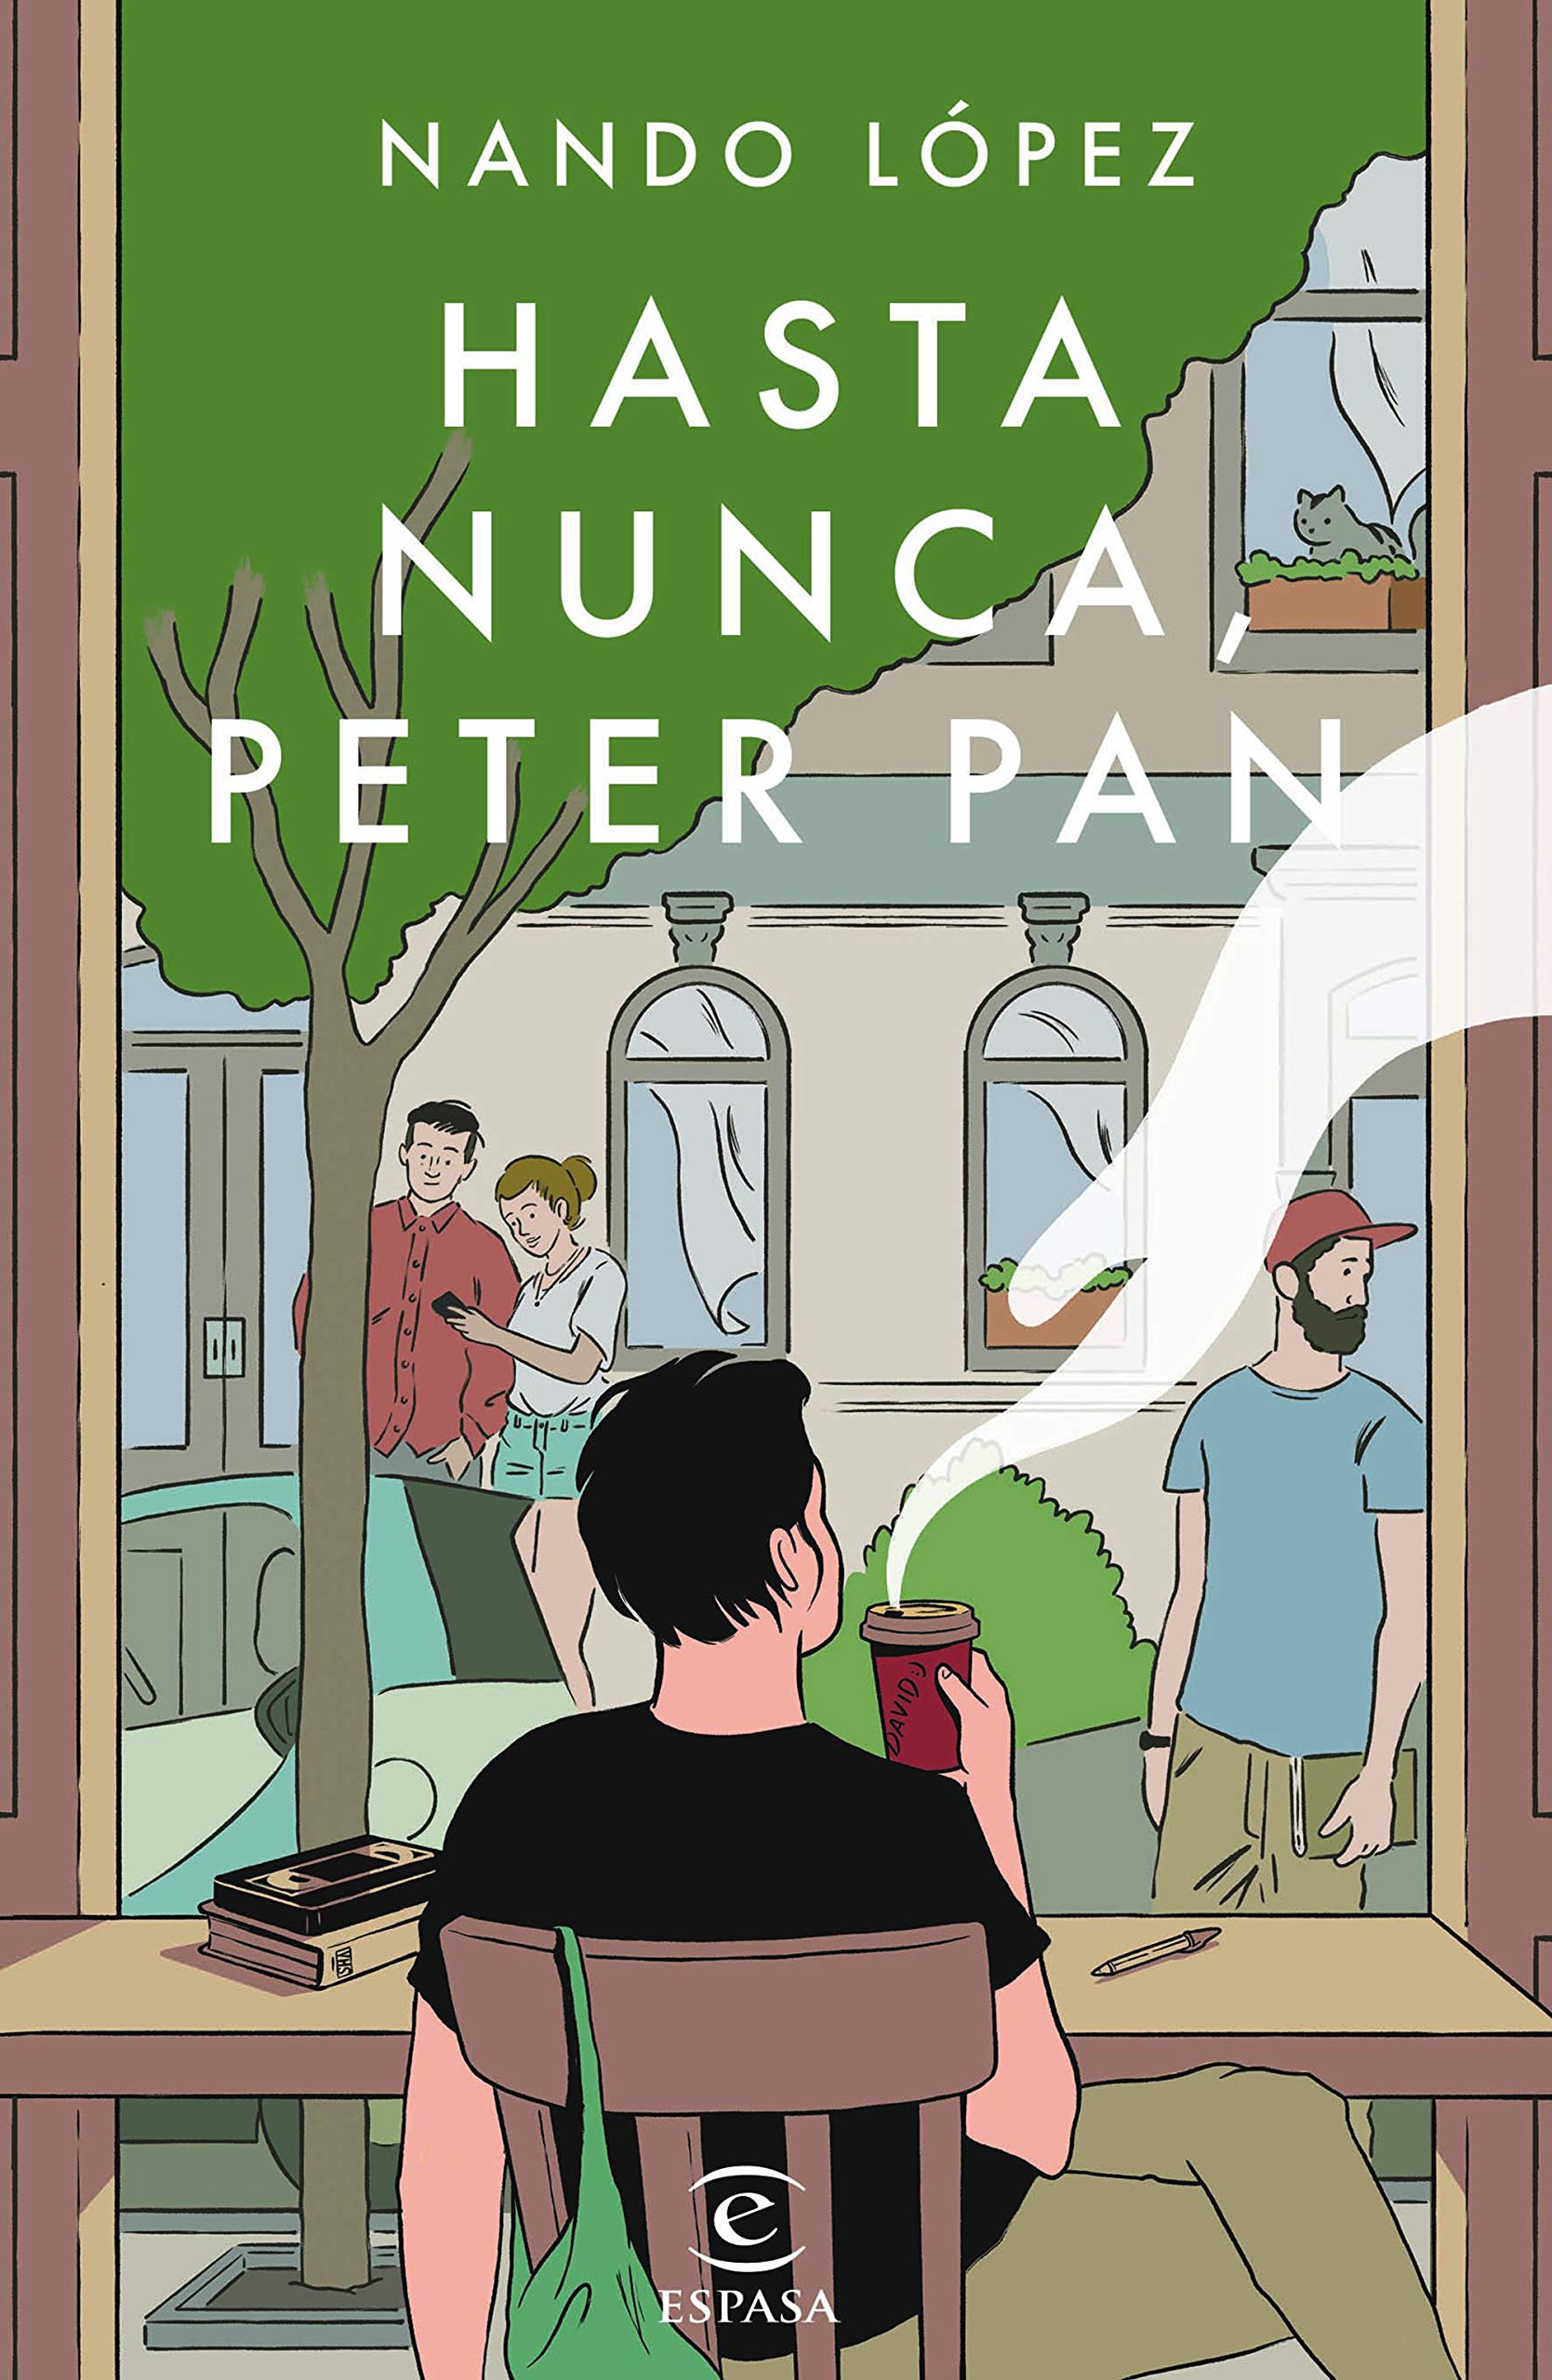 Hasta nunca Peter Pan, de Nando lópez